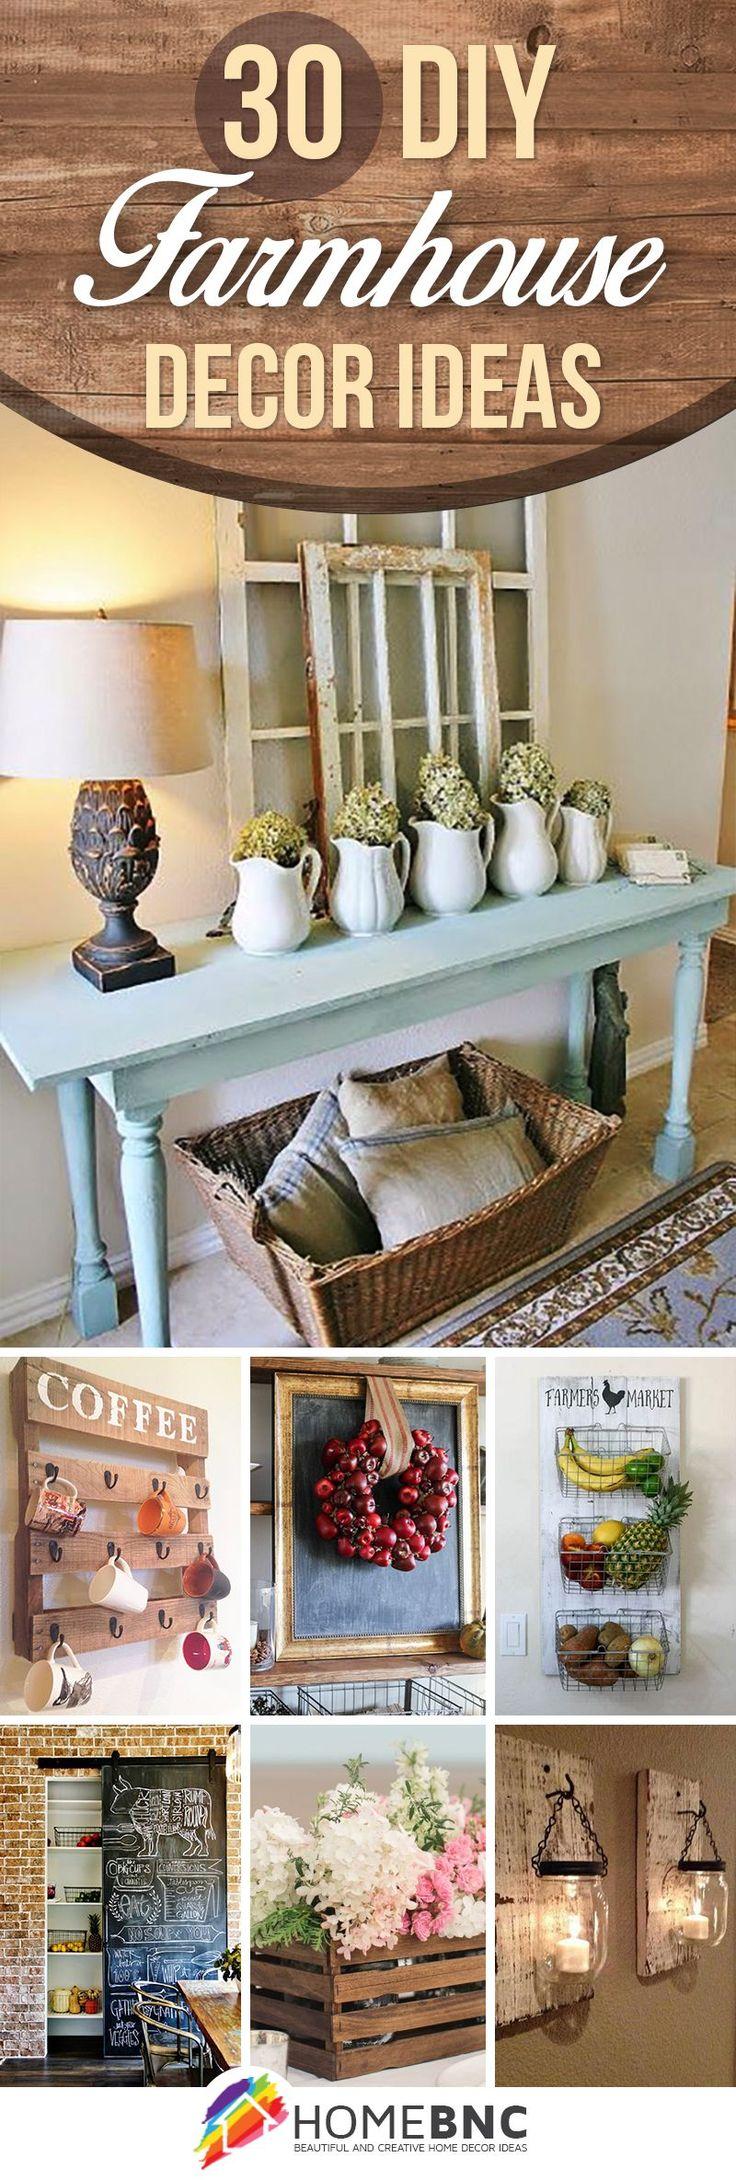 30 Ways DIY Farmhouse Decor Ideas Can Make Your Home Unique More